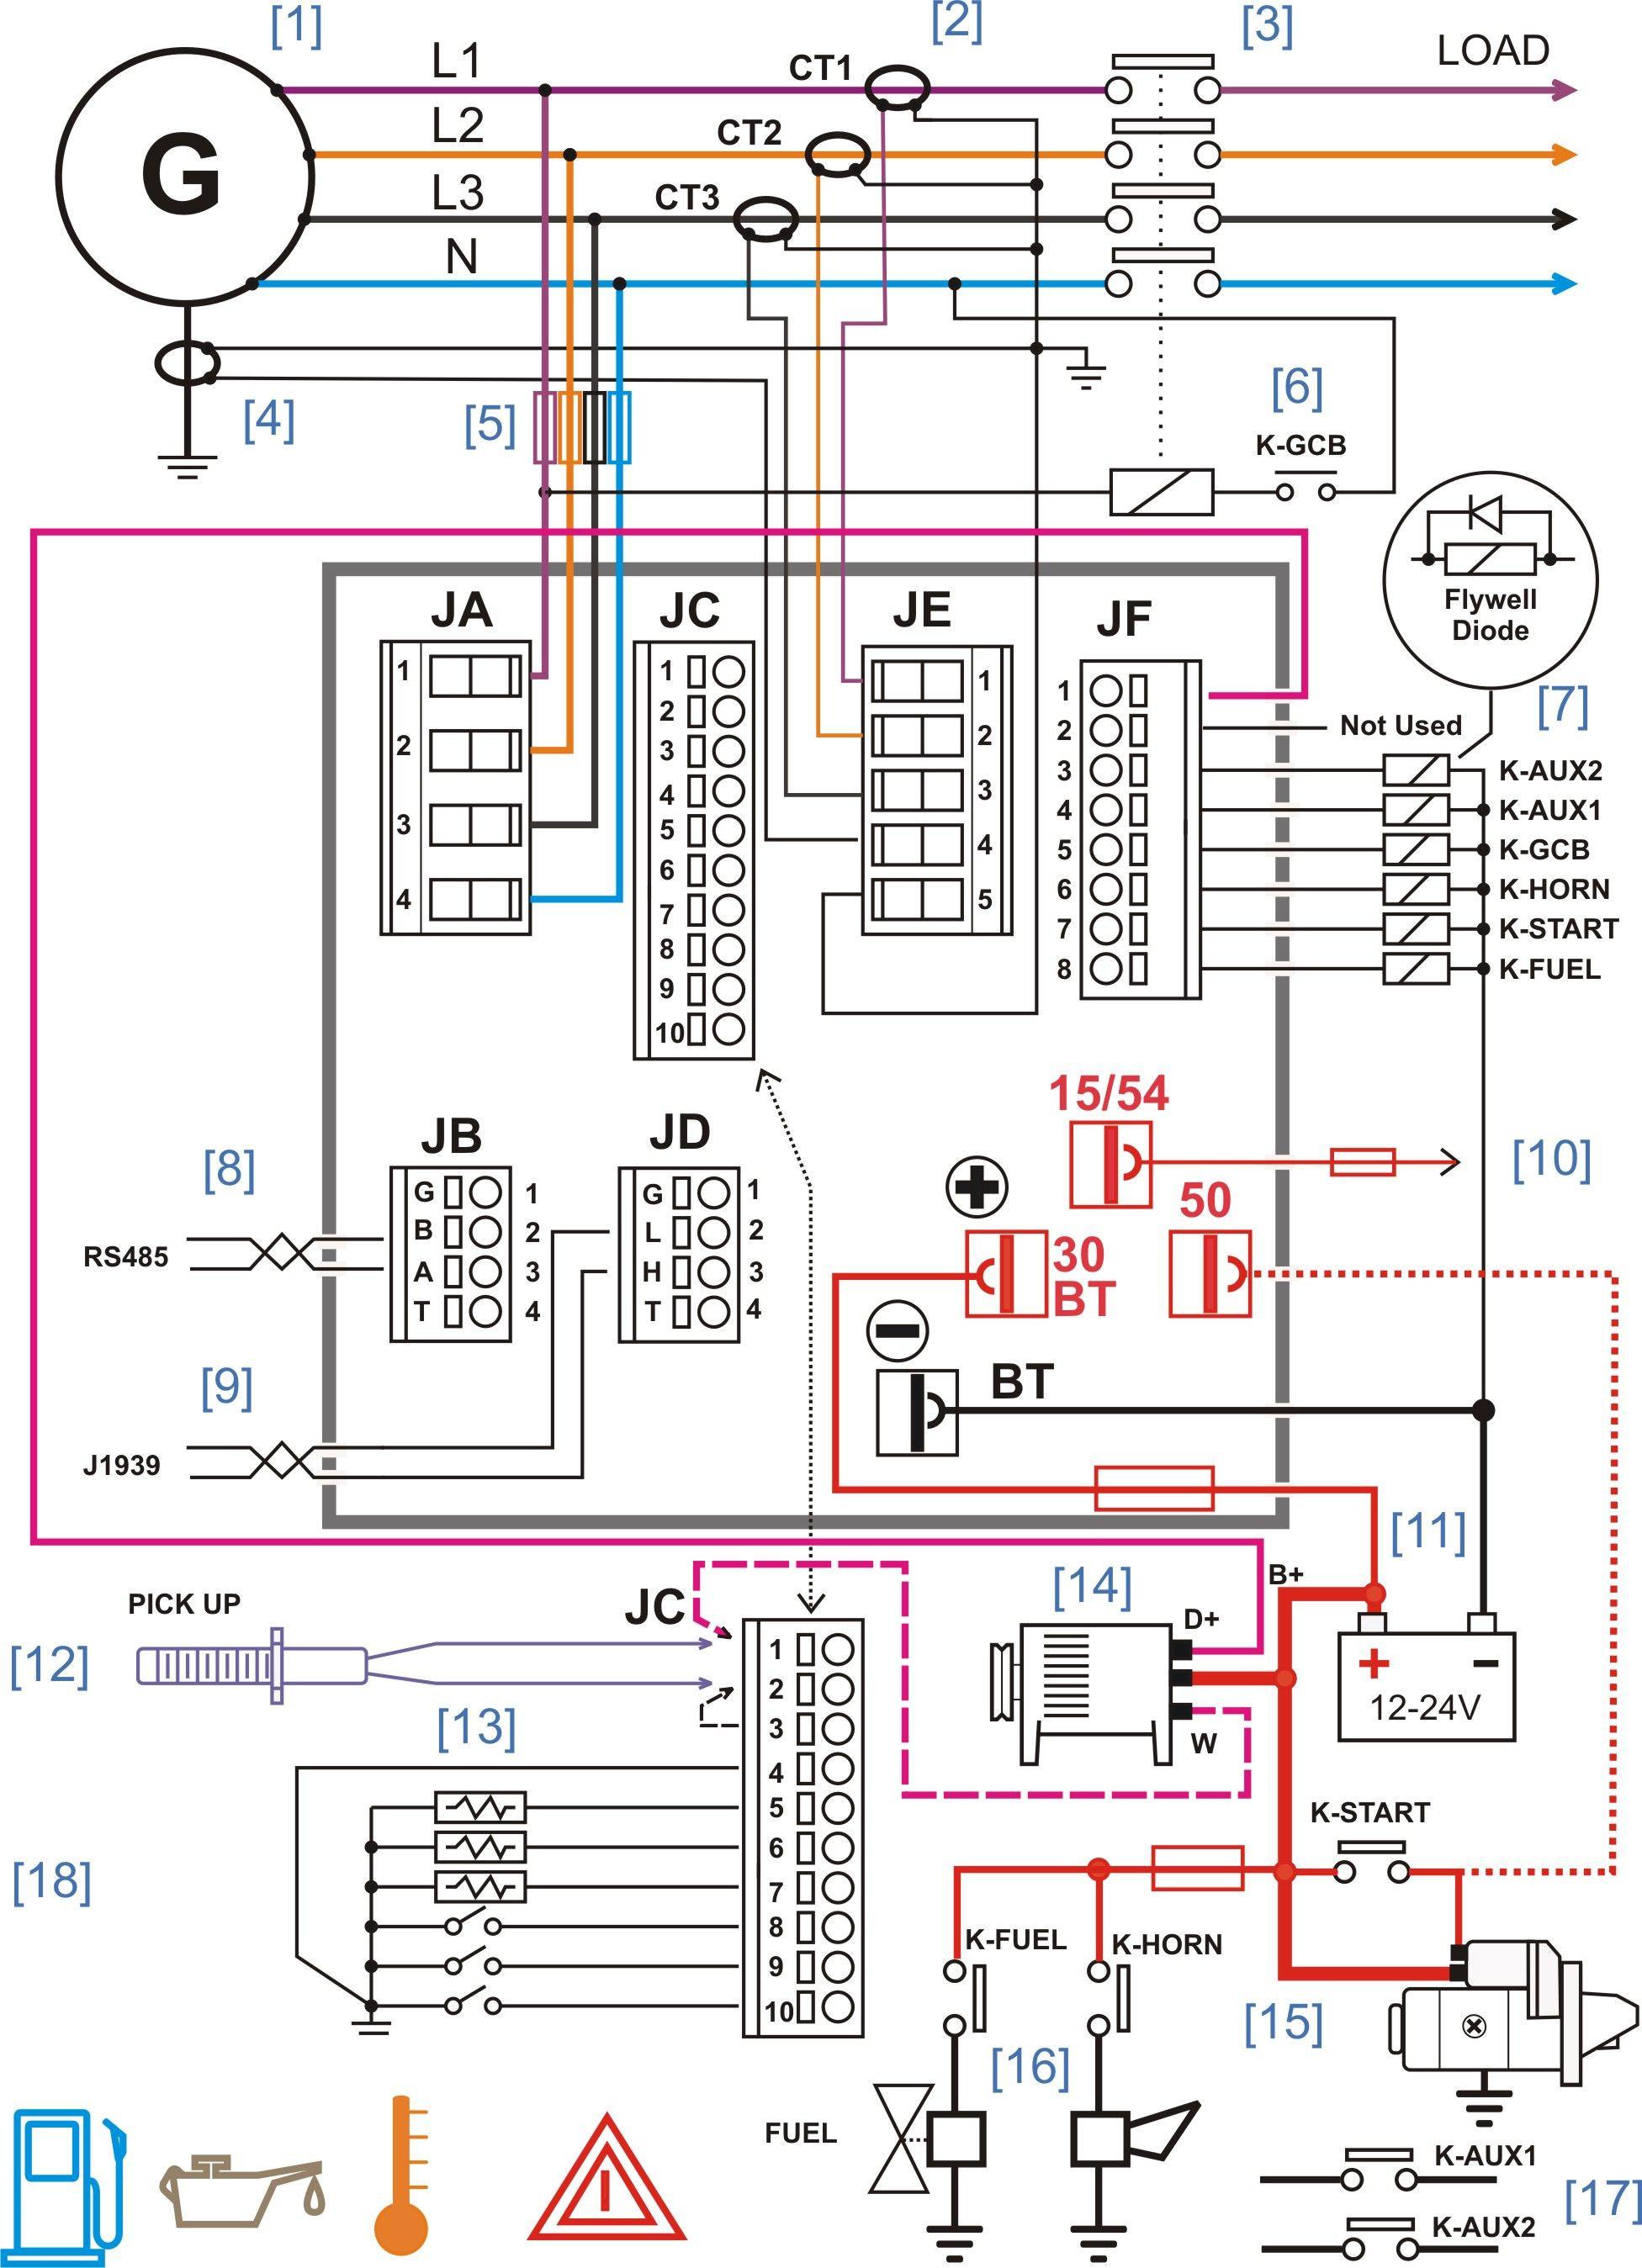 4 Wire Generator Wiring Diagram | Wiring Diagram - 4 Prong Generator Plug Wiring Diagram